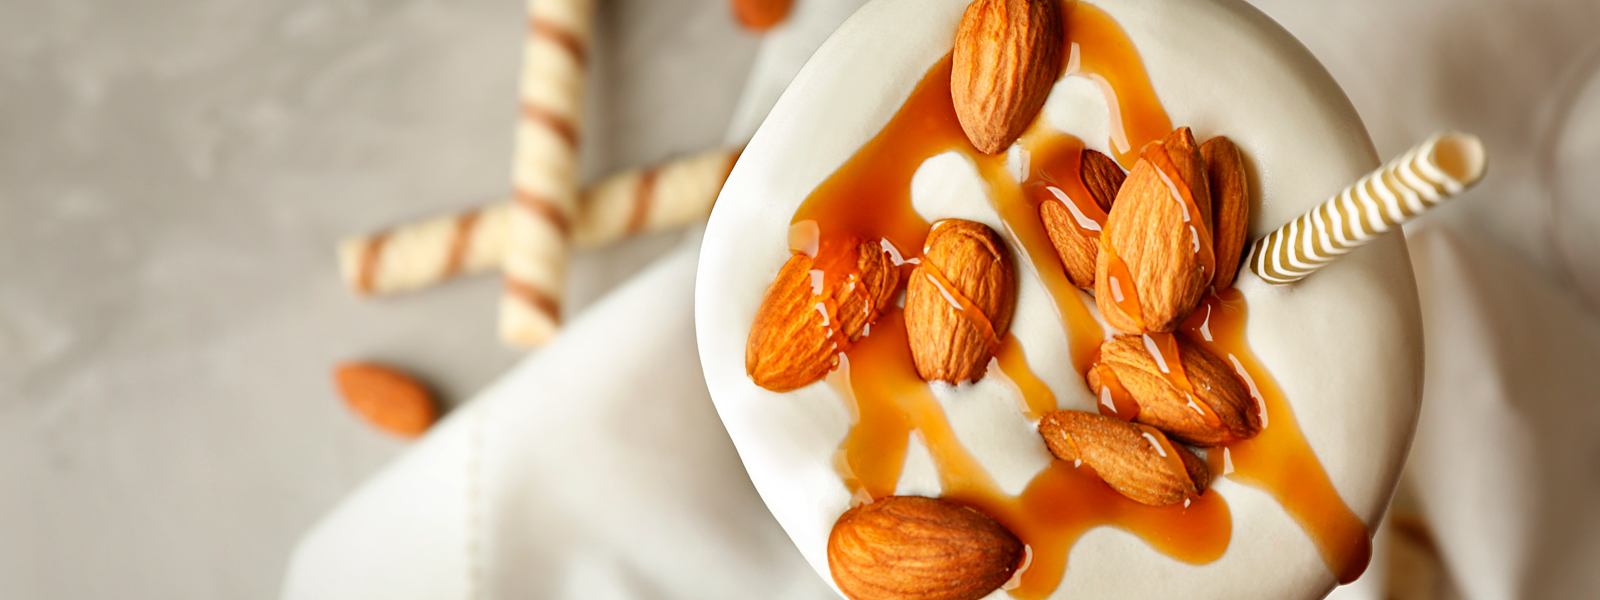 banner-home-carino-ingredientes-caldas-coberturas-chocolate-frutas-nuts-caramelo